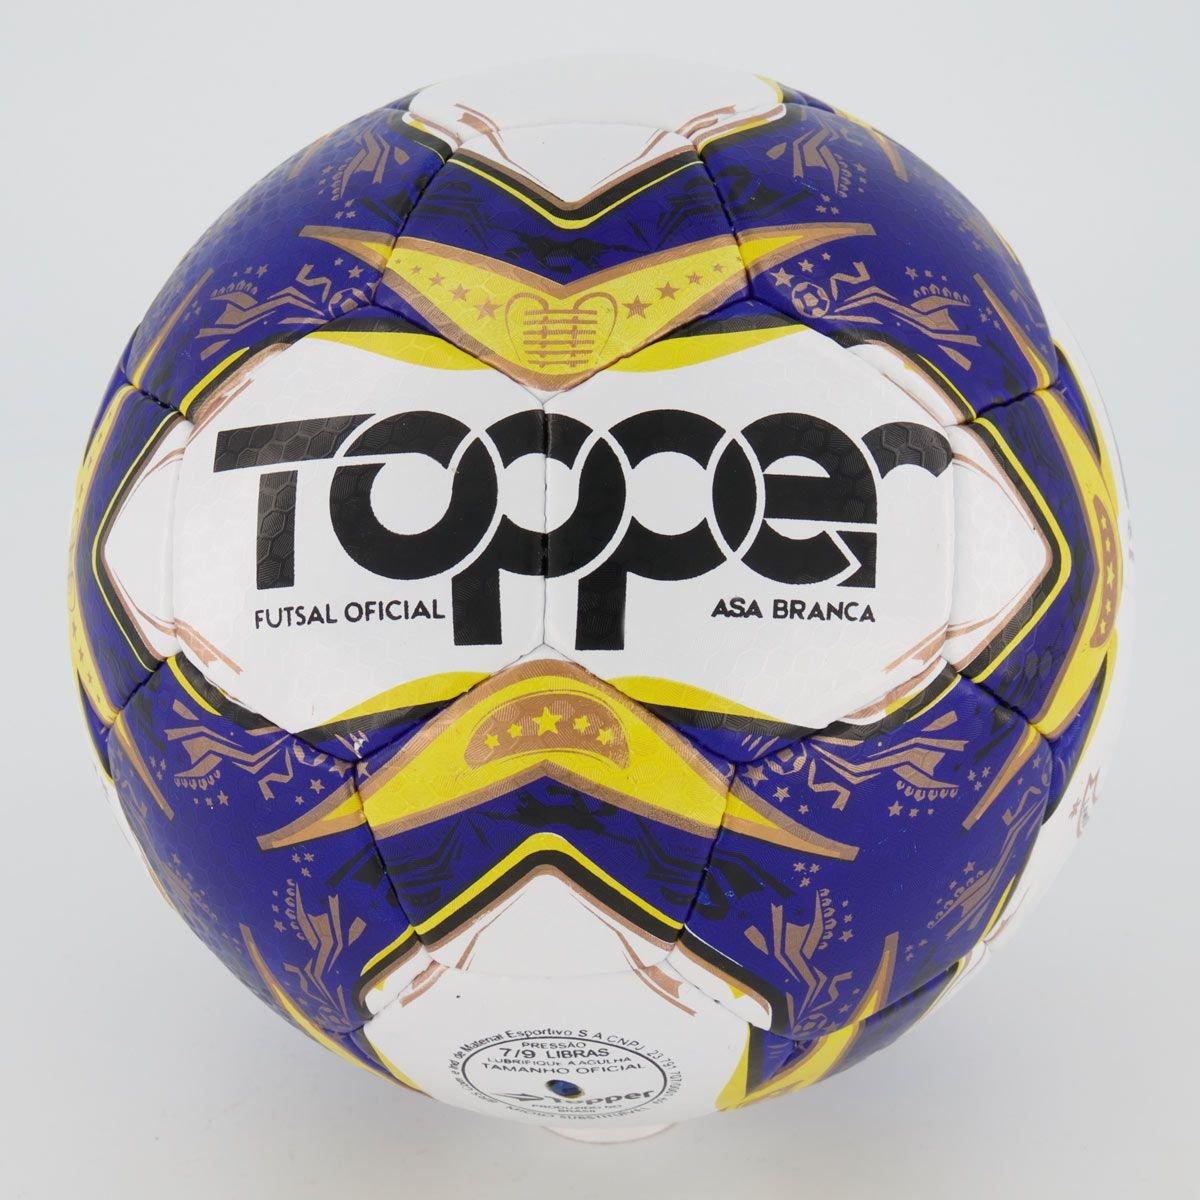 Bola Futsal Asa Branca C/C Topper